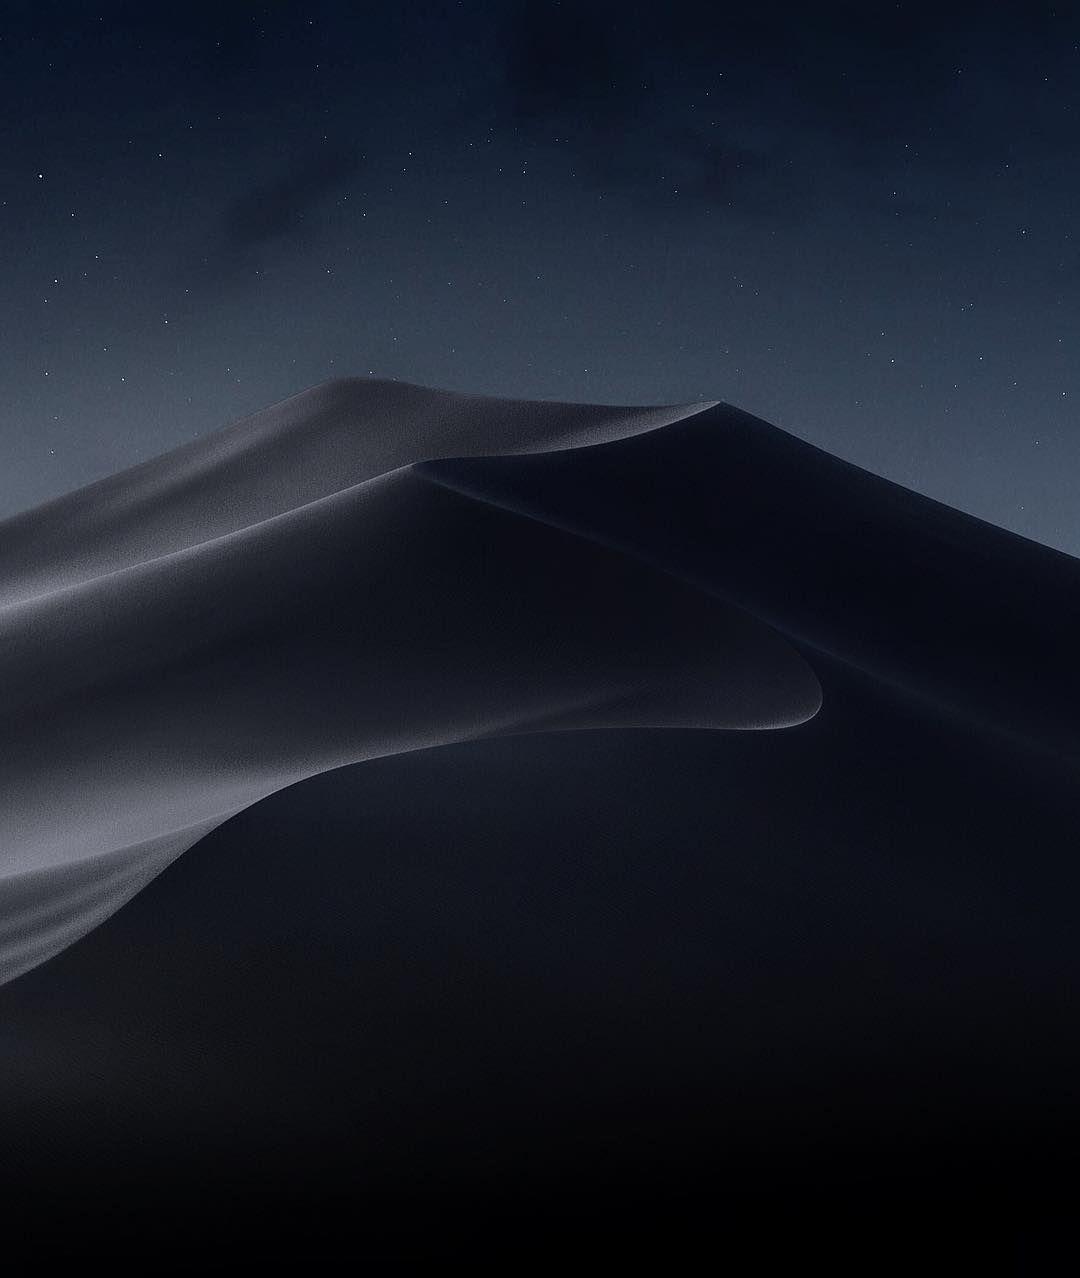 Wallpapers For Mac Hd: MacBook Next Dark Mode Wallpaper. Yes Or No ?